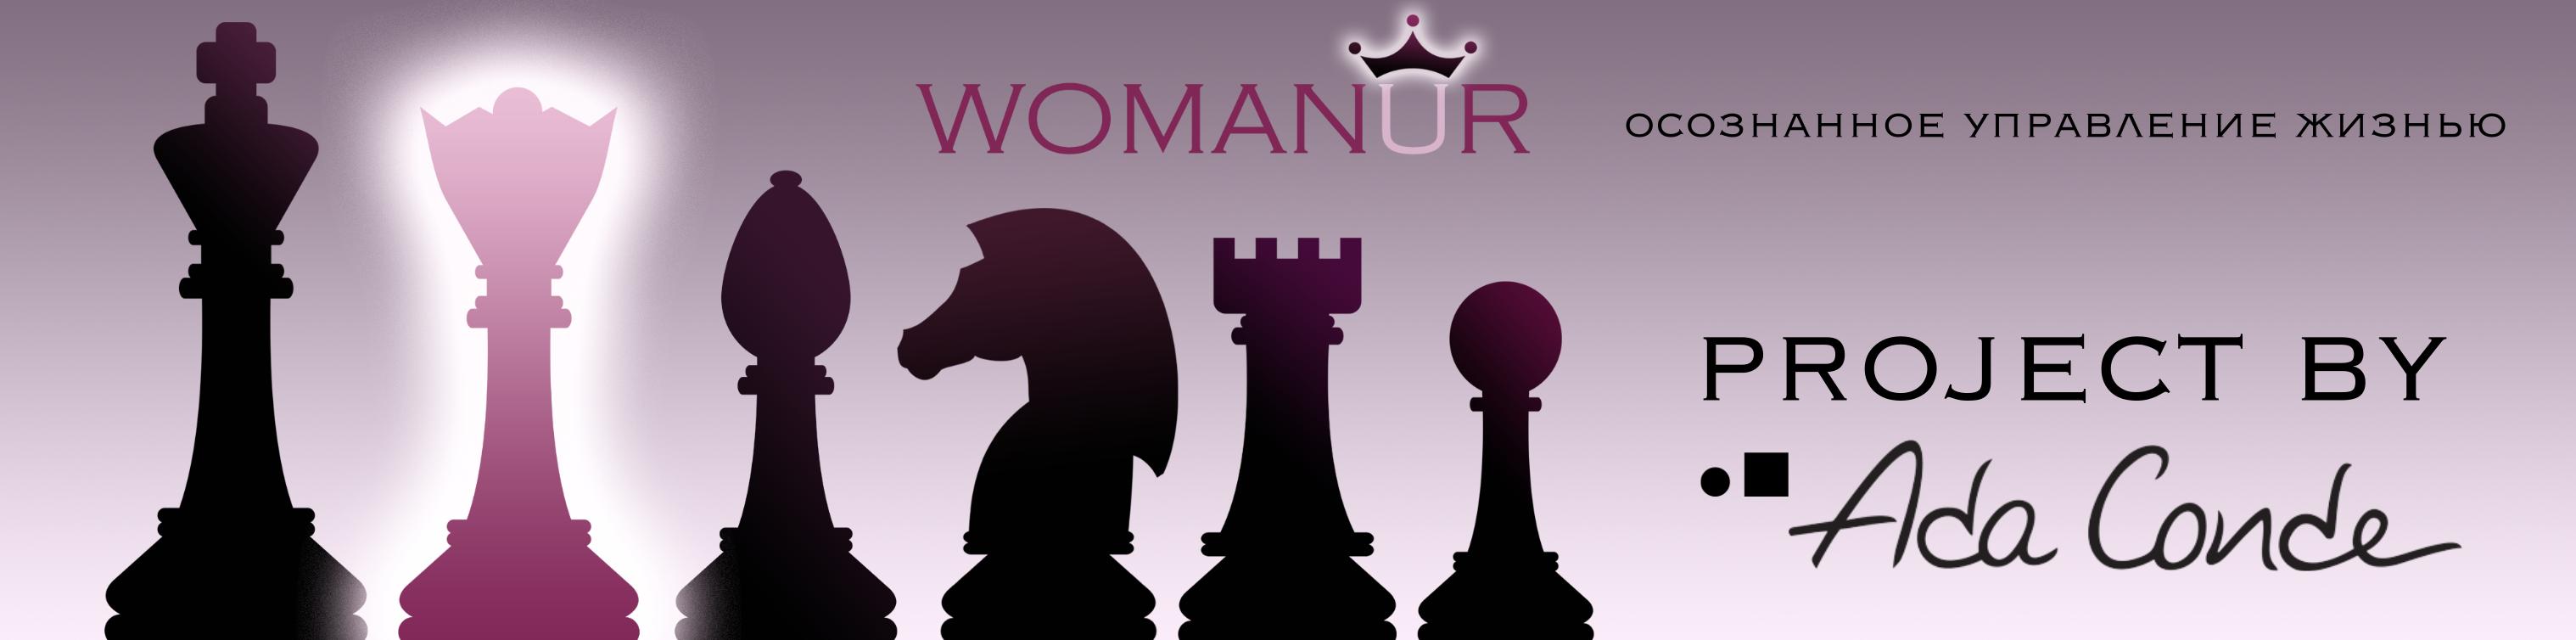 WOMANUR